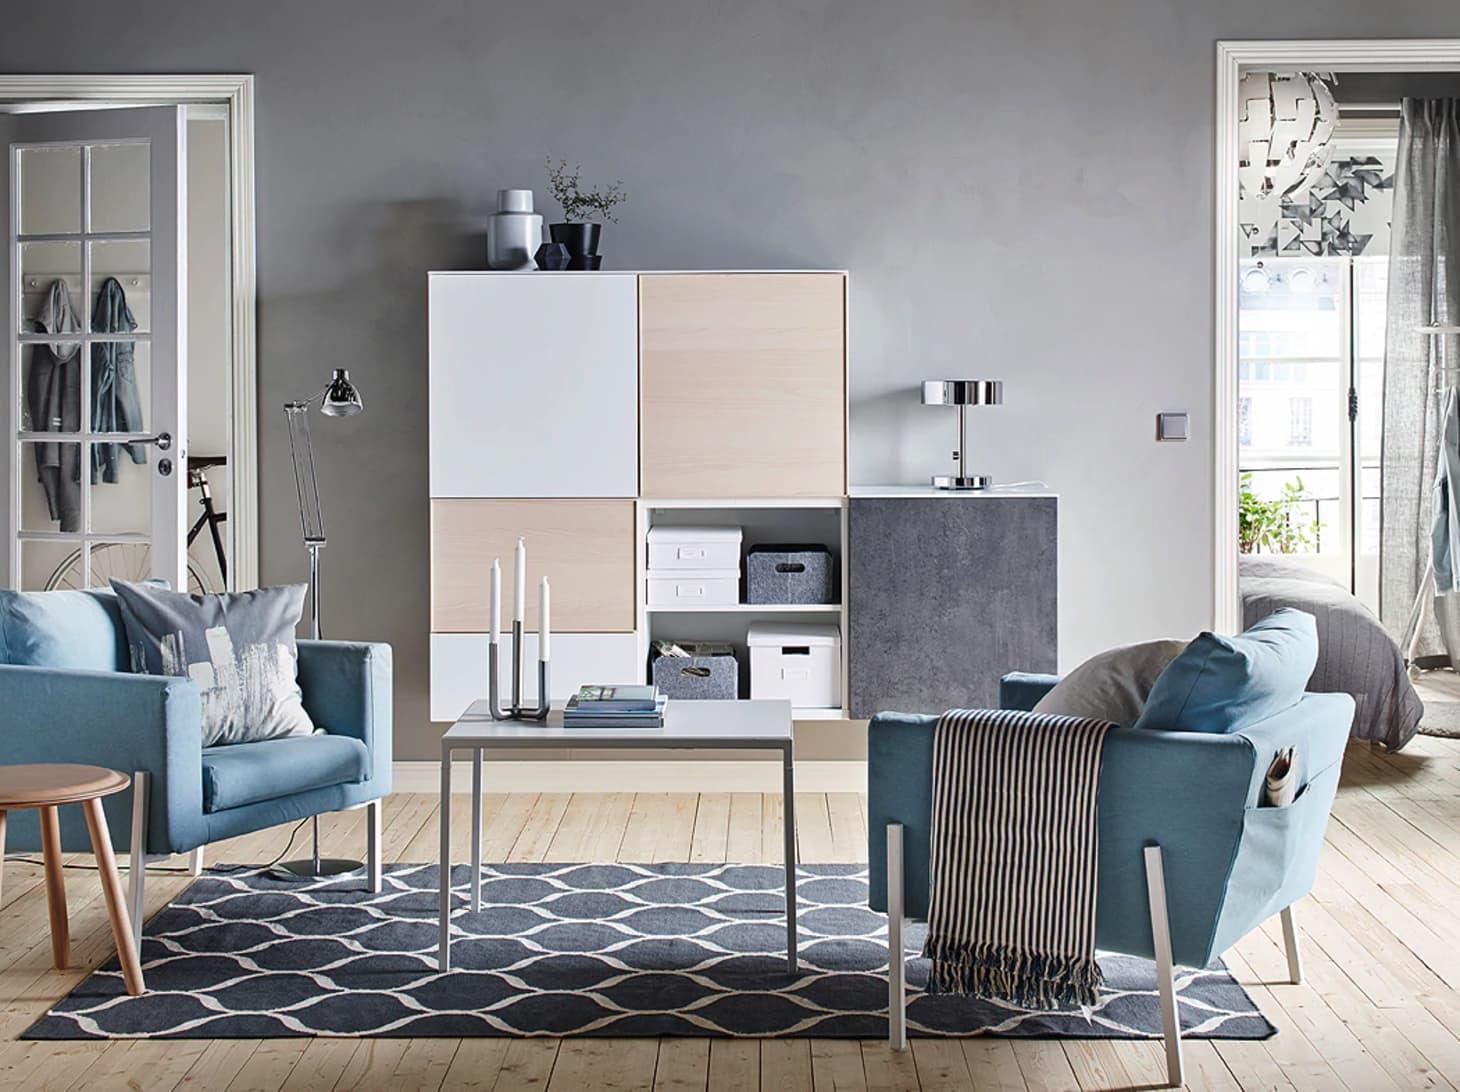 Ikea Living Room Photos cozy ikea living room design ideas - ikea living rooms